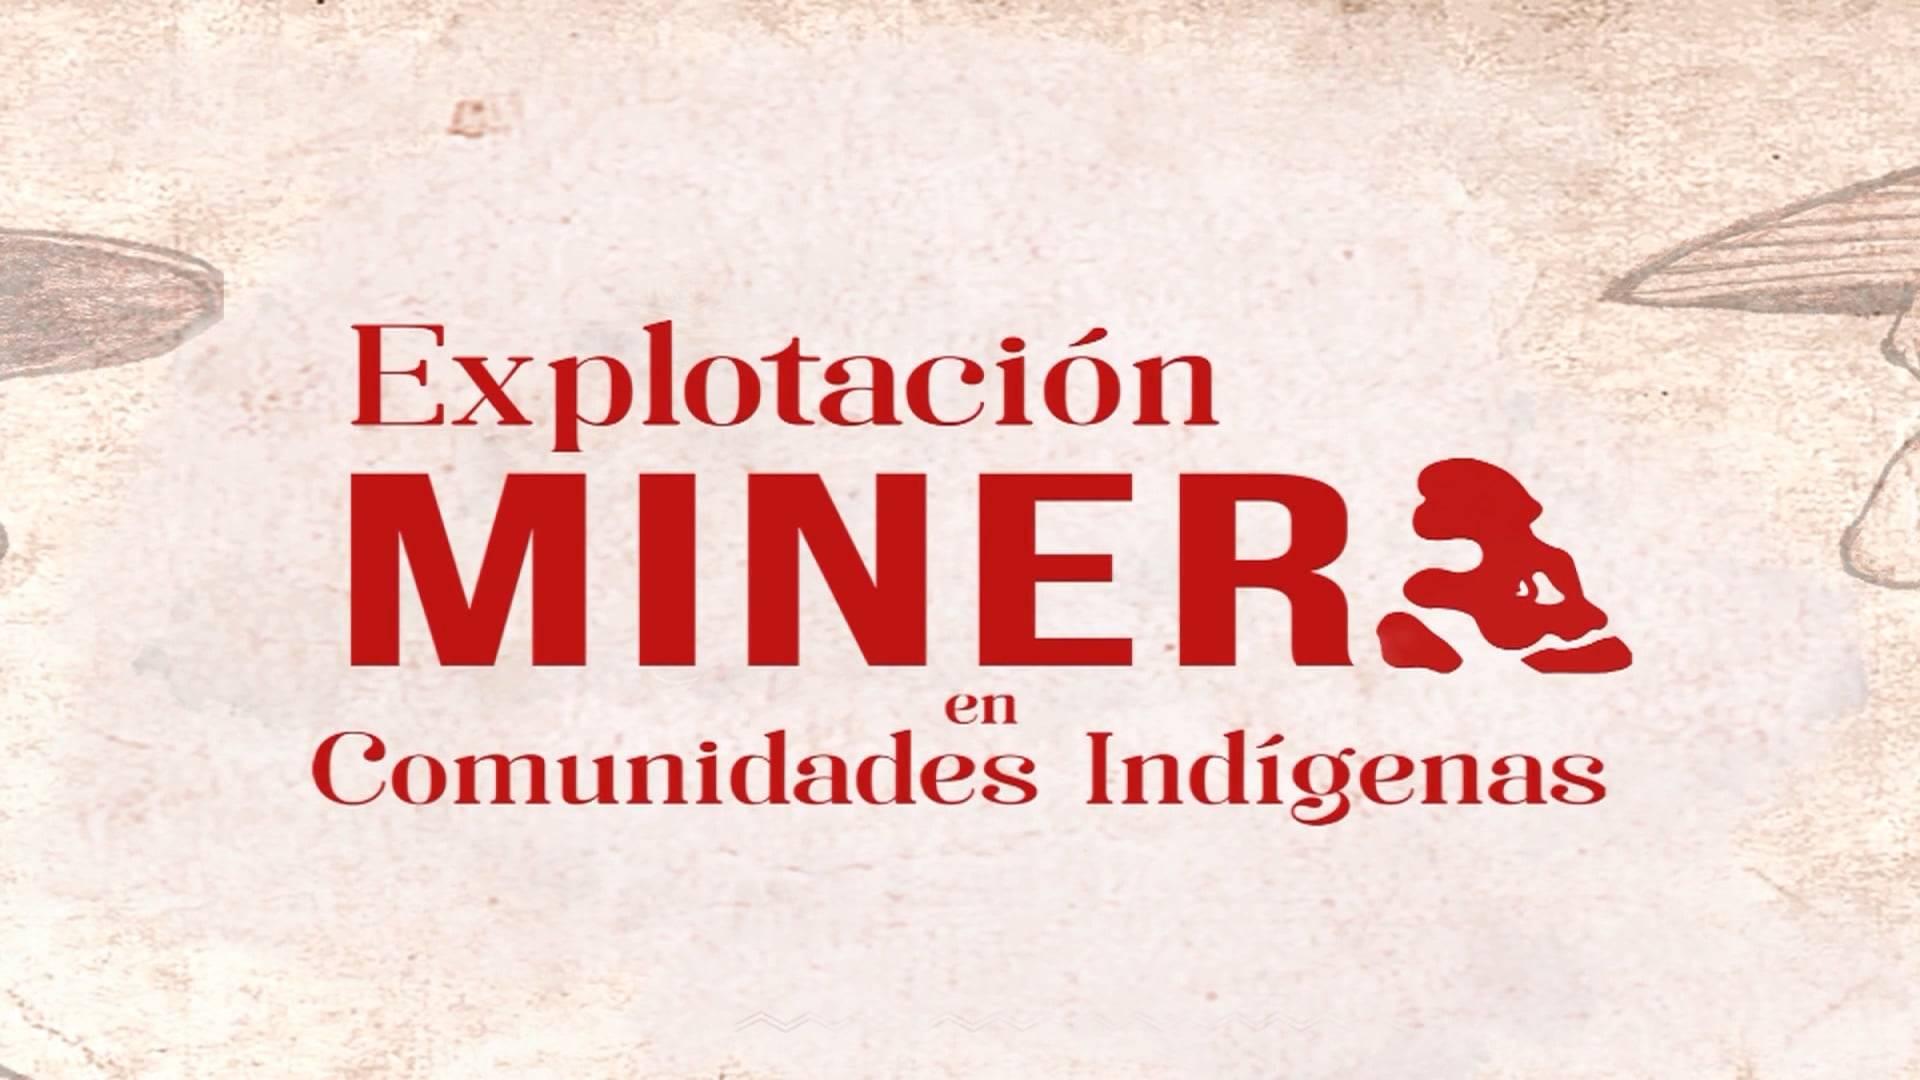 autonomias-territoriales-explotacion-minera-comunidades-indigenas